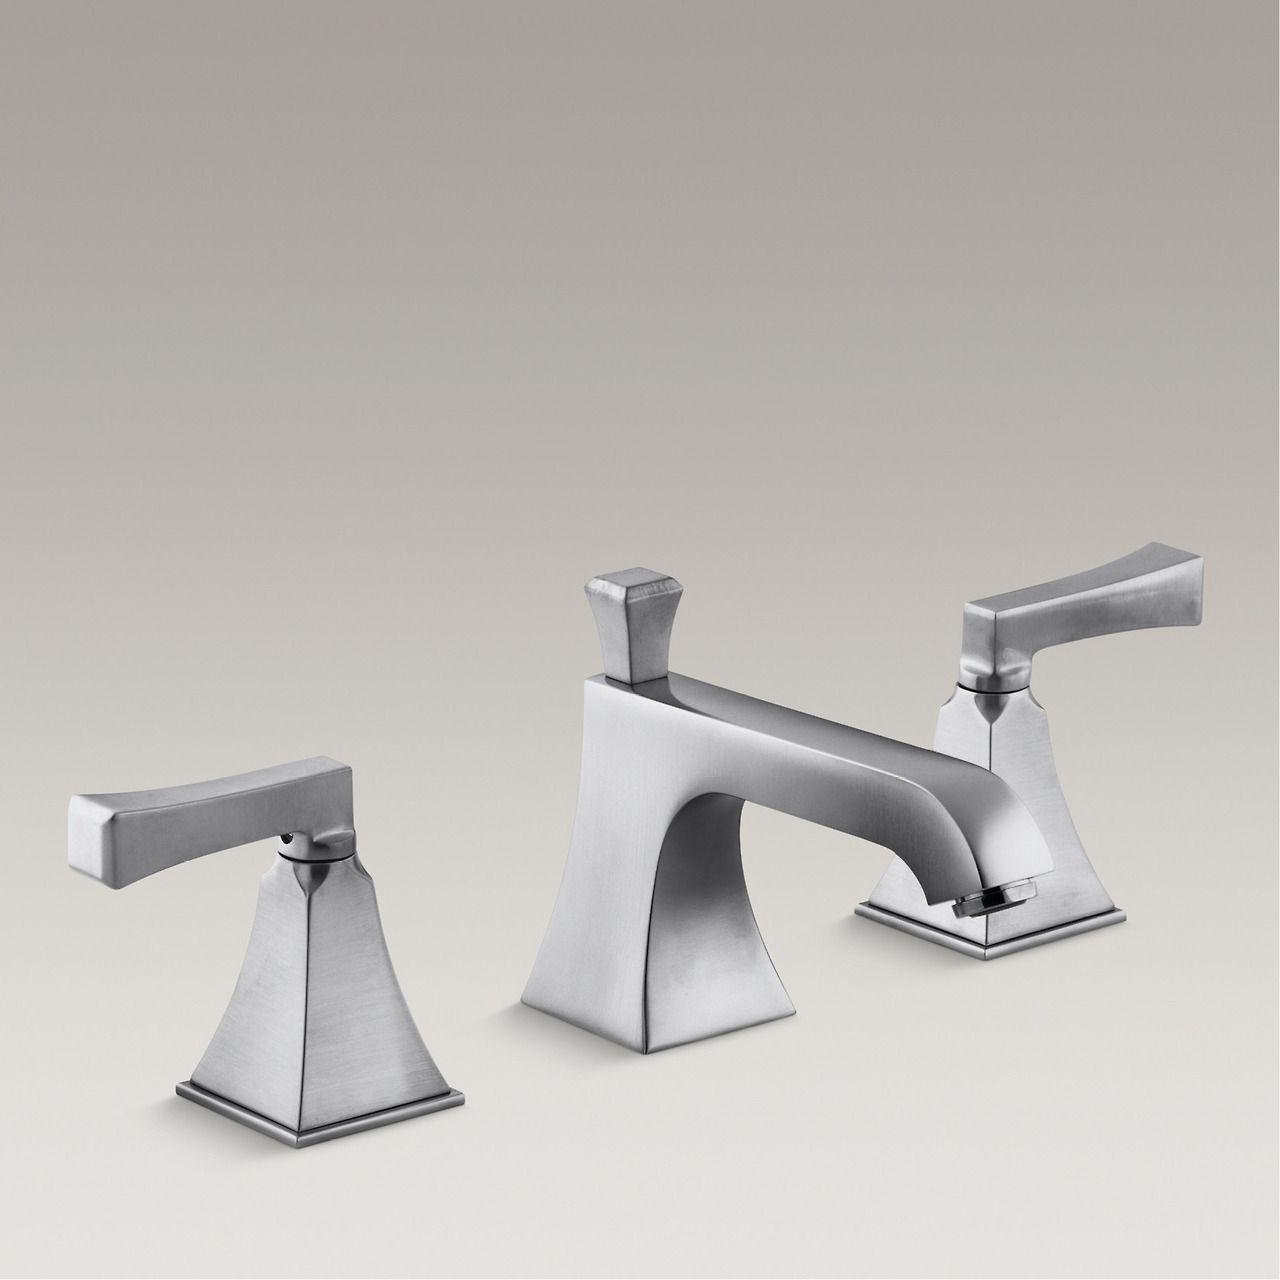 widespread bathroom sink faucet sin memoirsr widespread bathroom sink faucet  with deco lever handles .